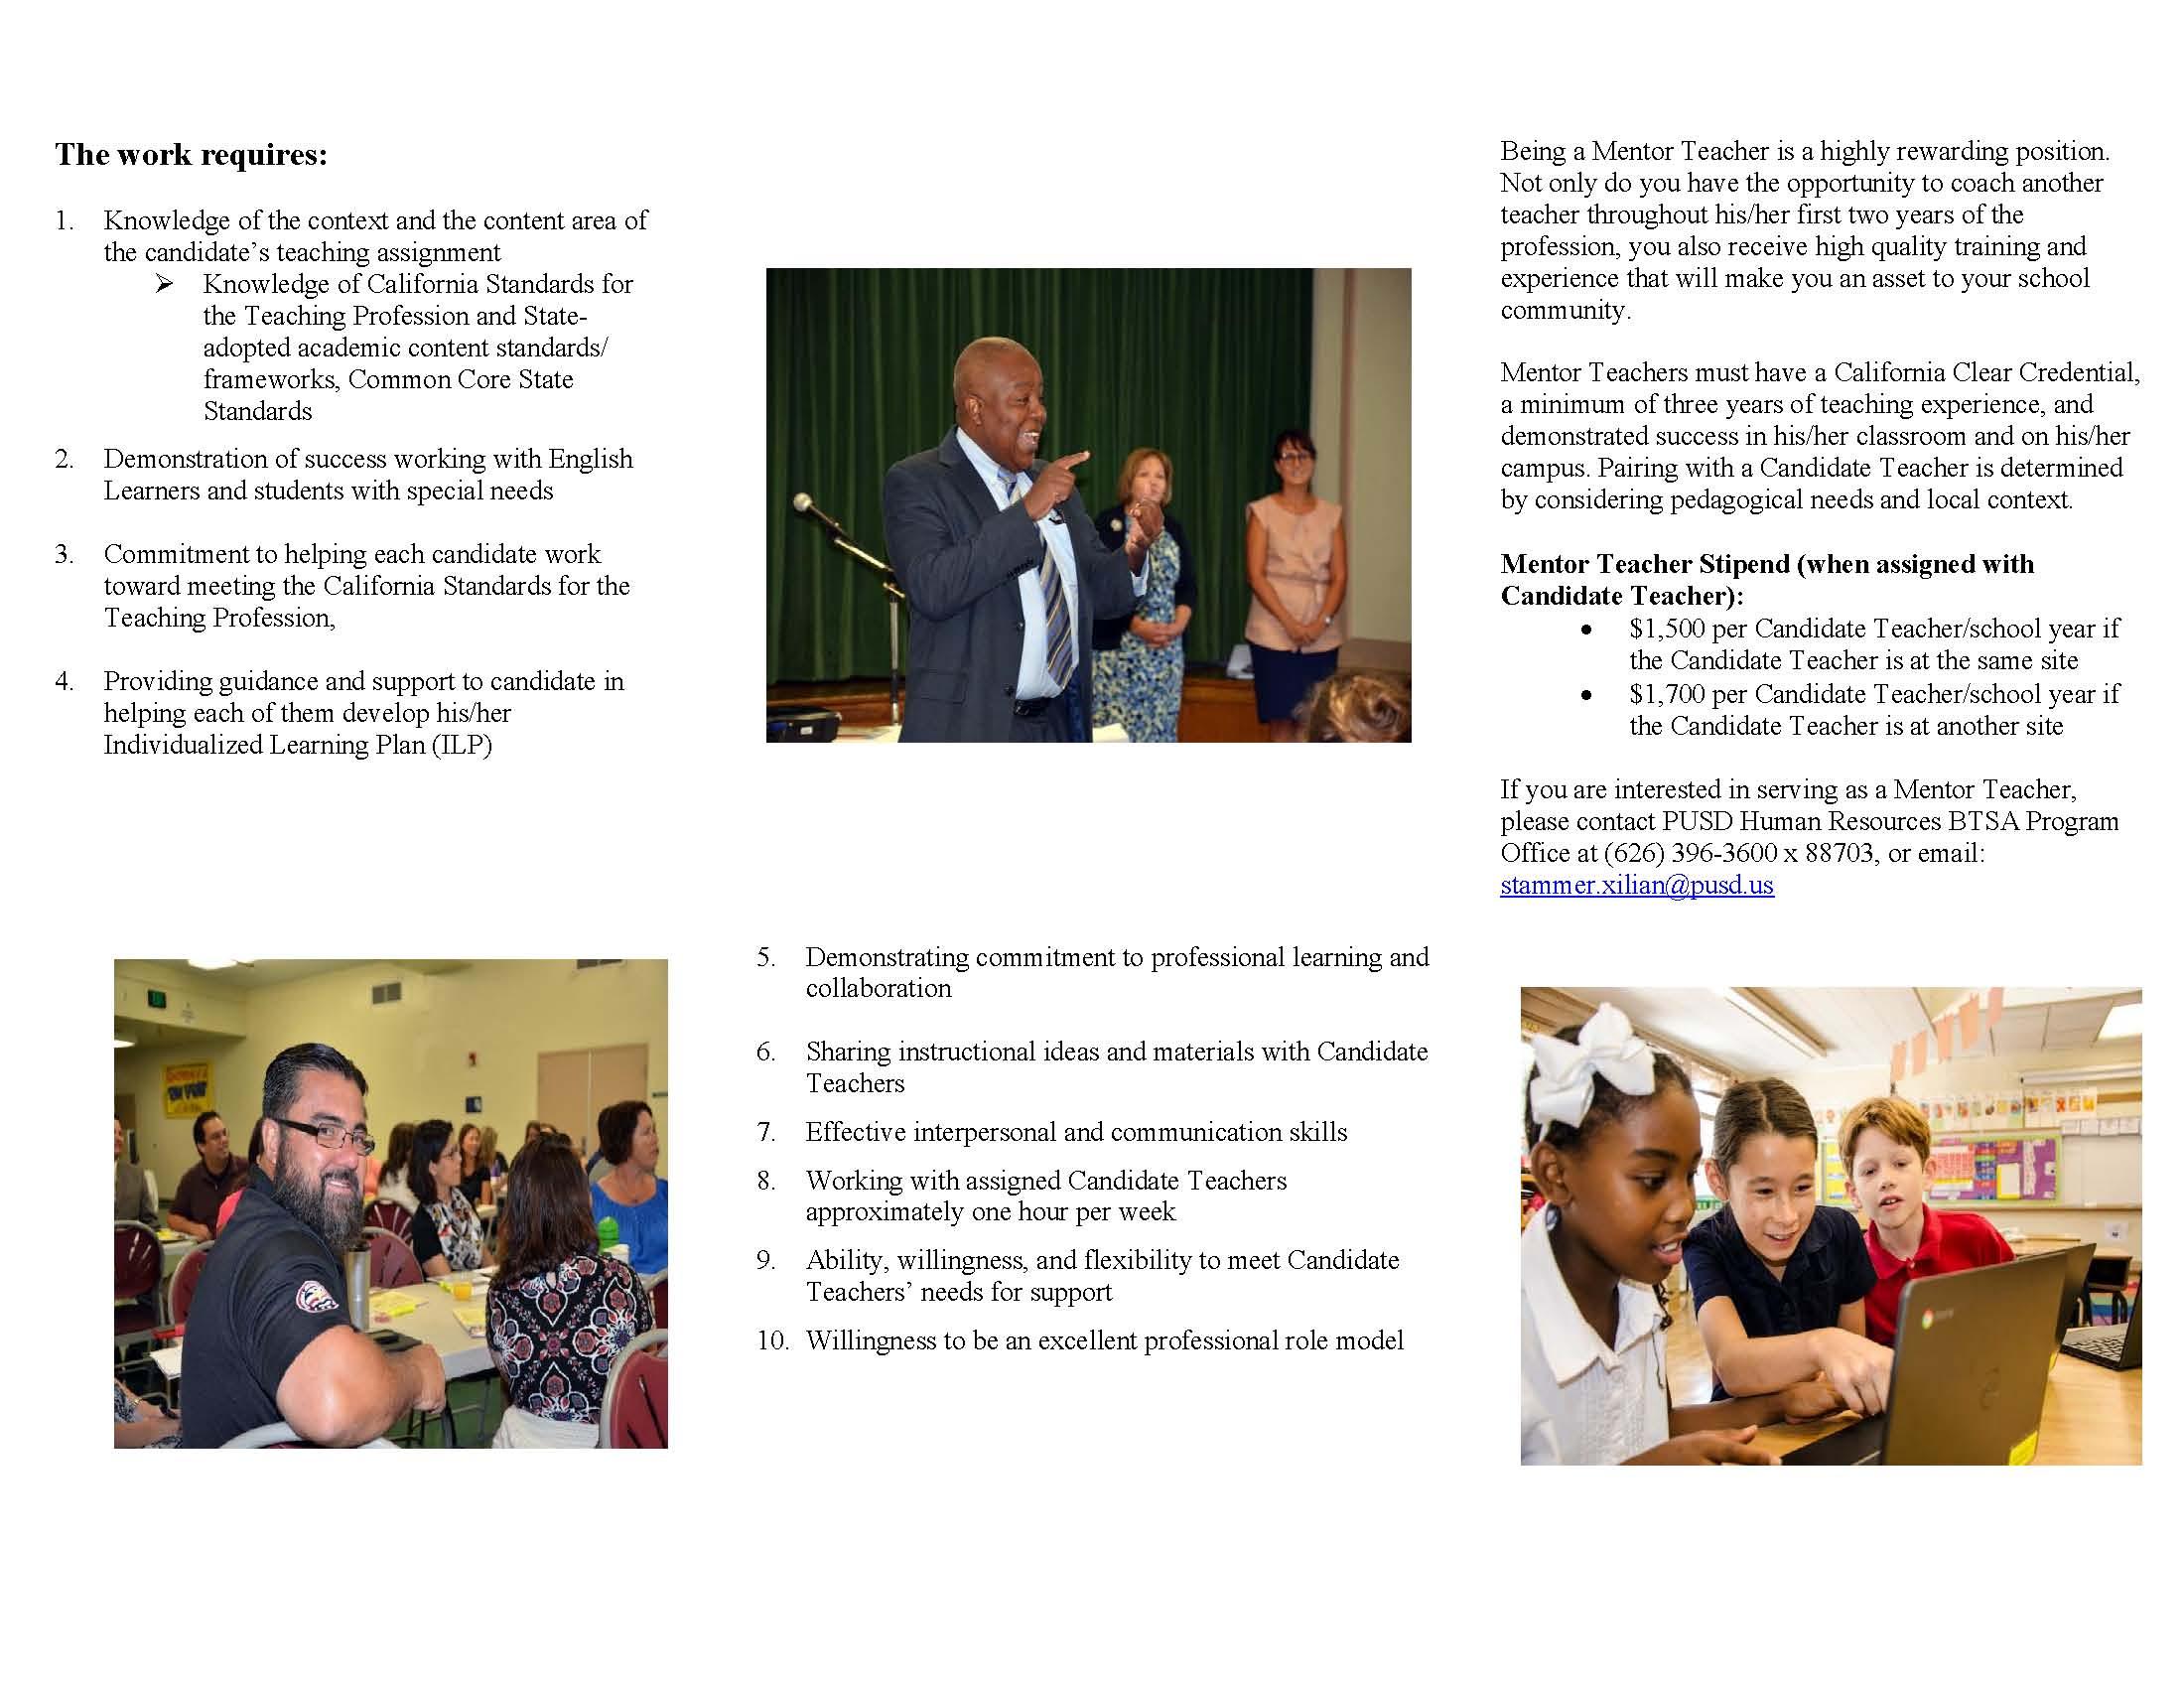 Human Resources / Teacher Induction Program